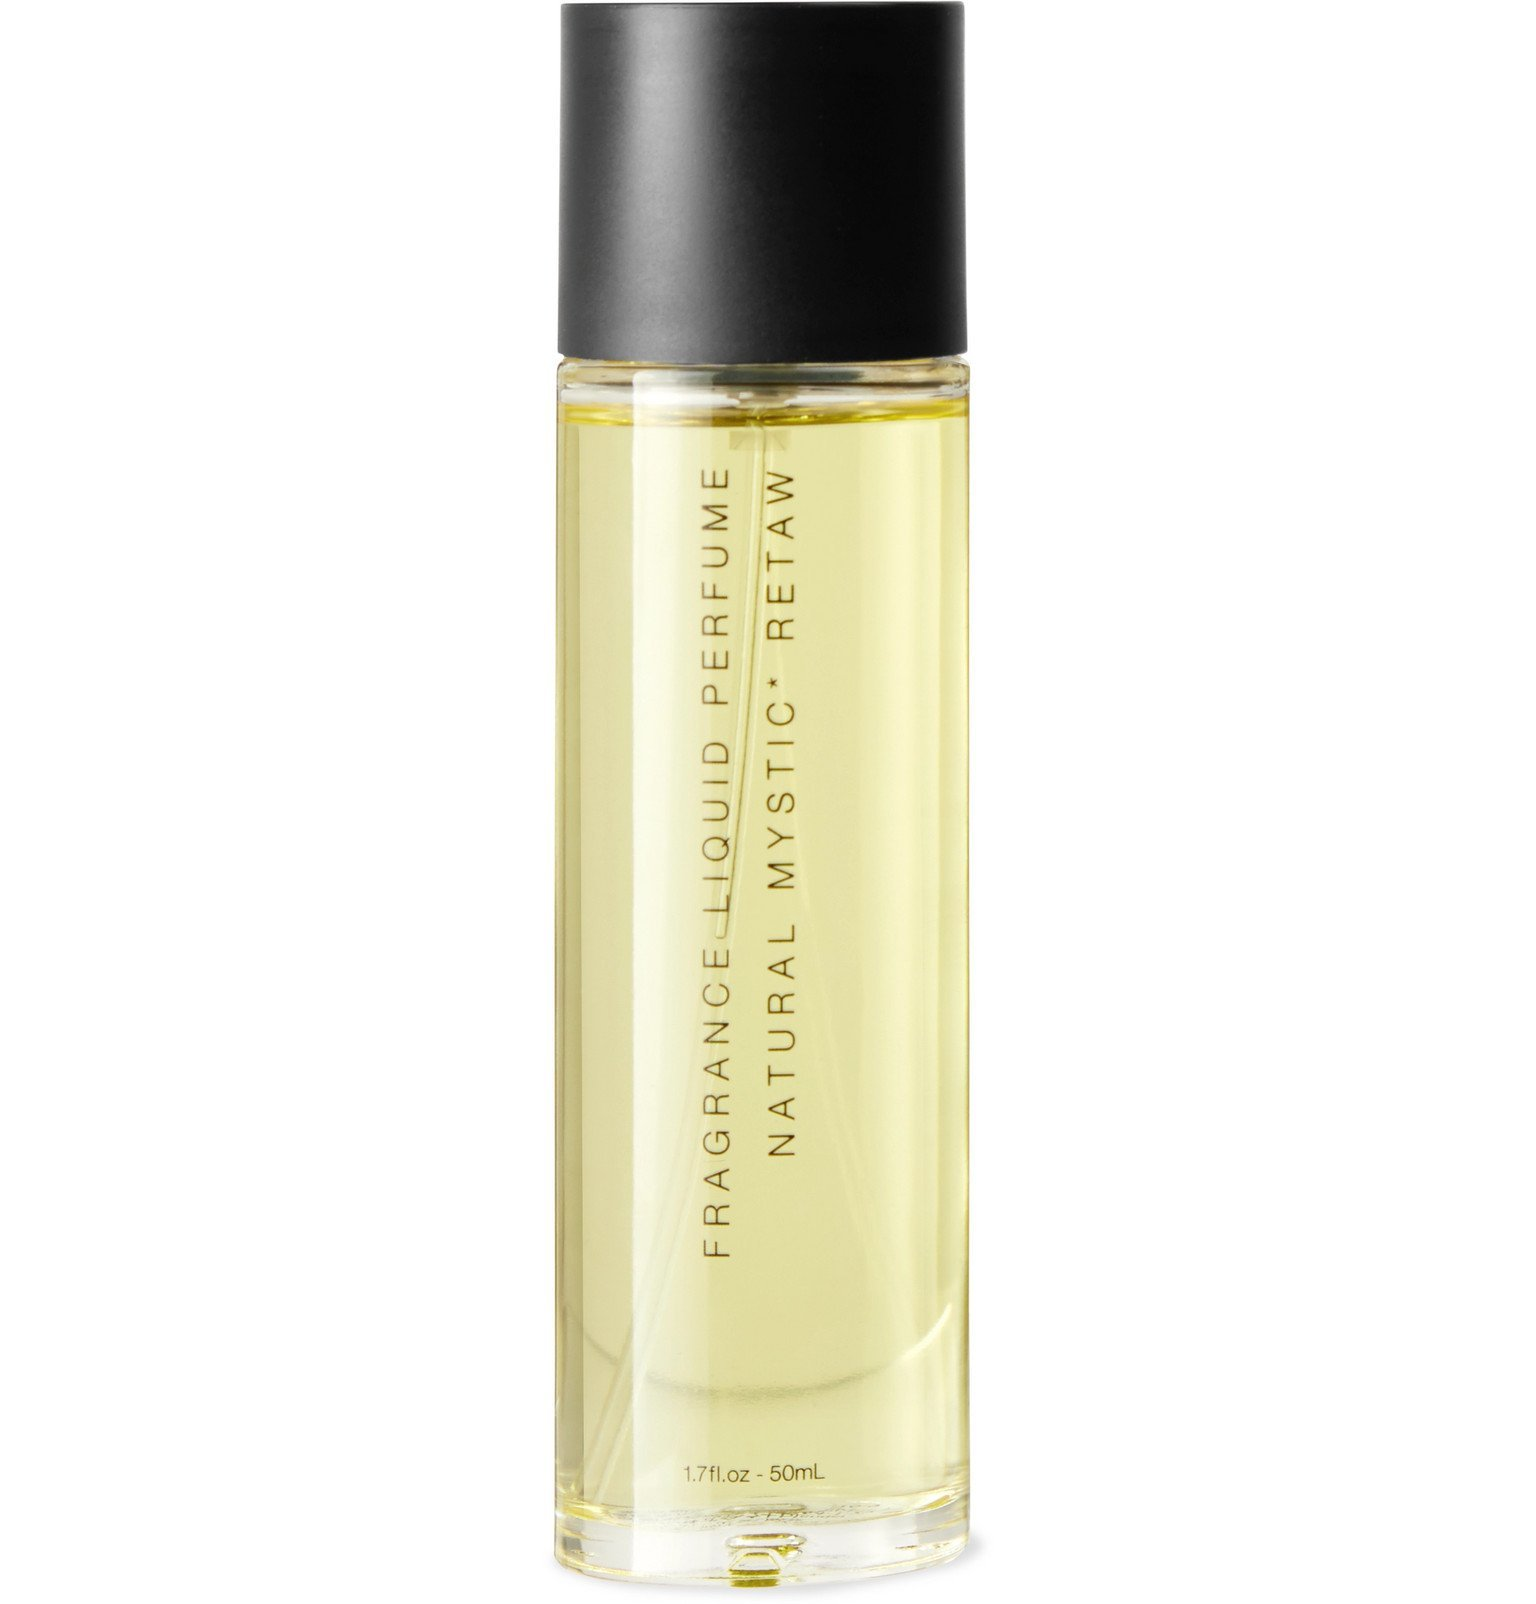 Photo: retaW - Liquid Perfume - Natural Mystic, 50ml - Colorless